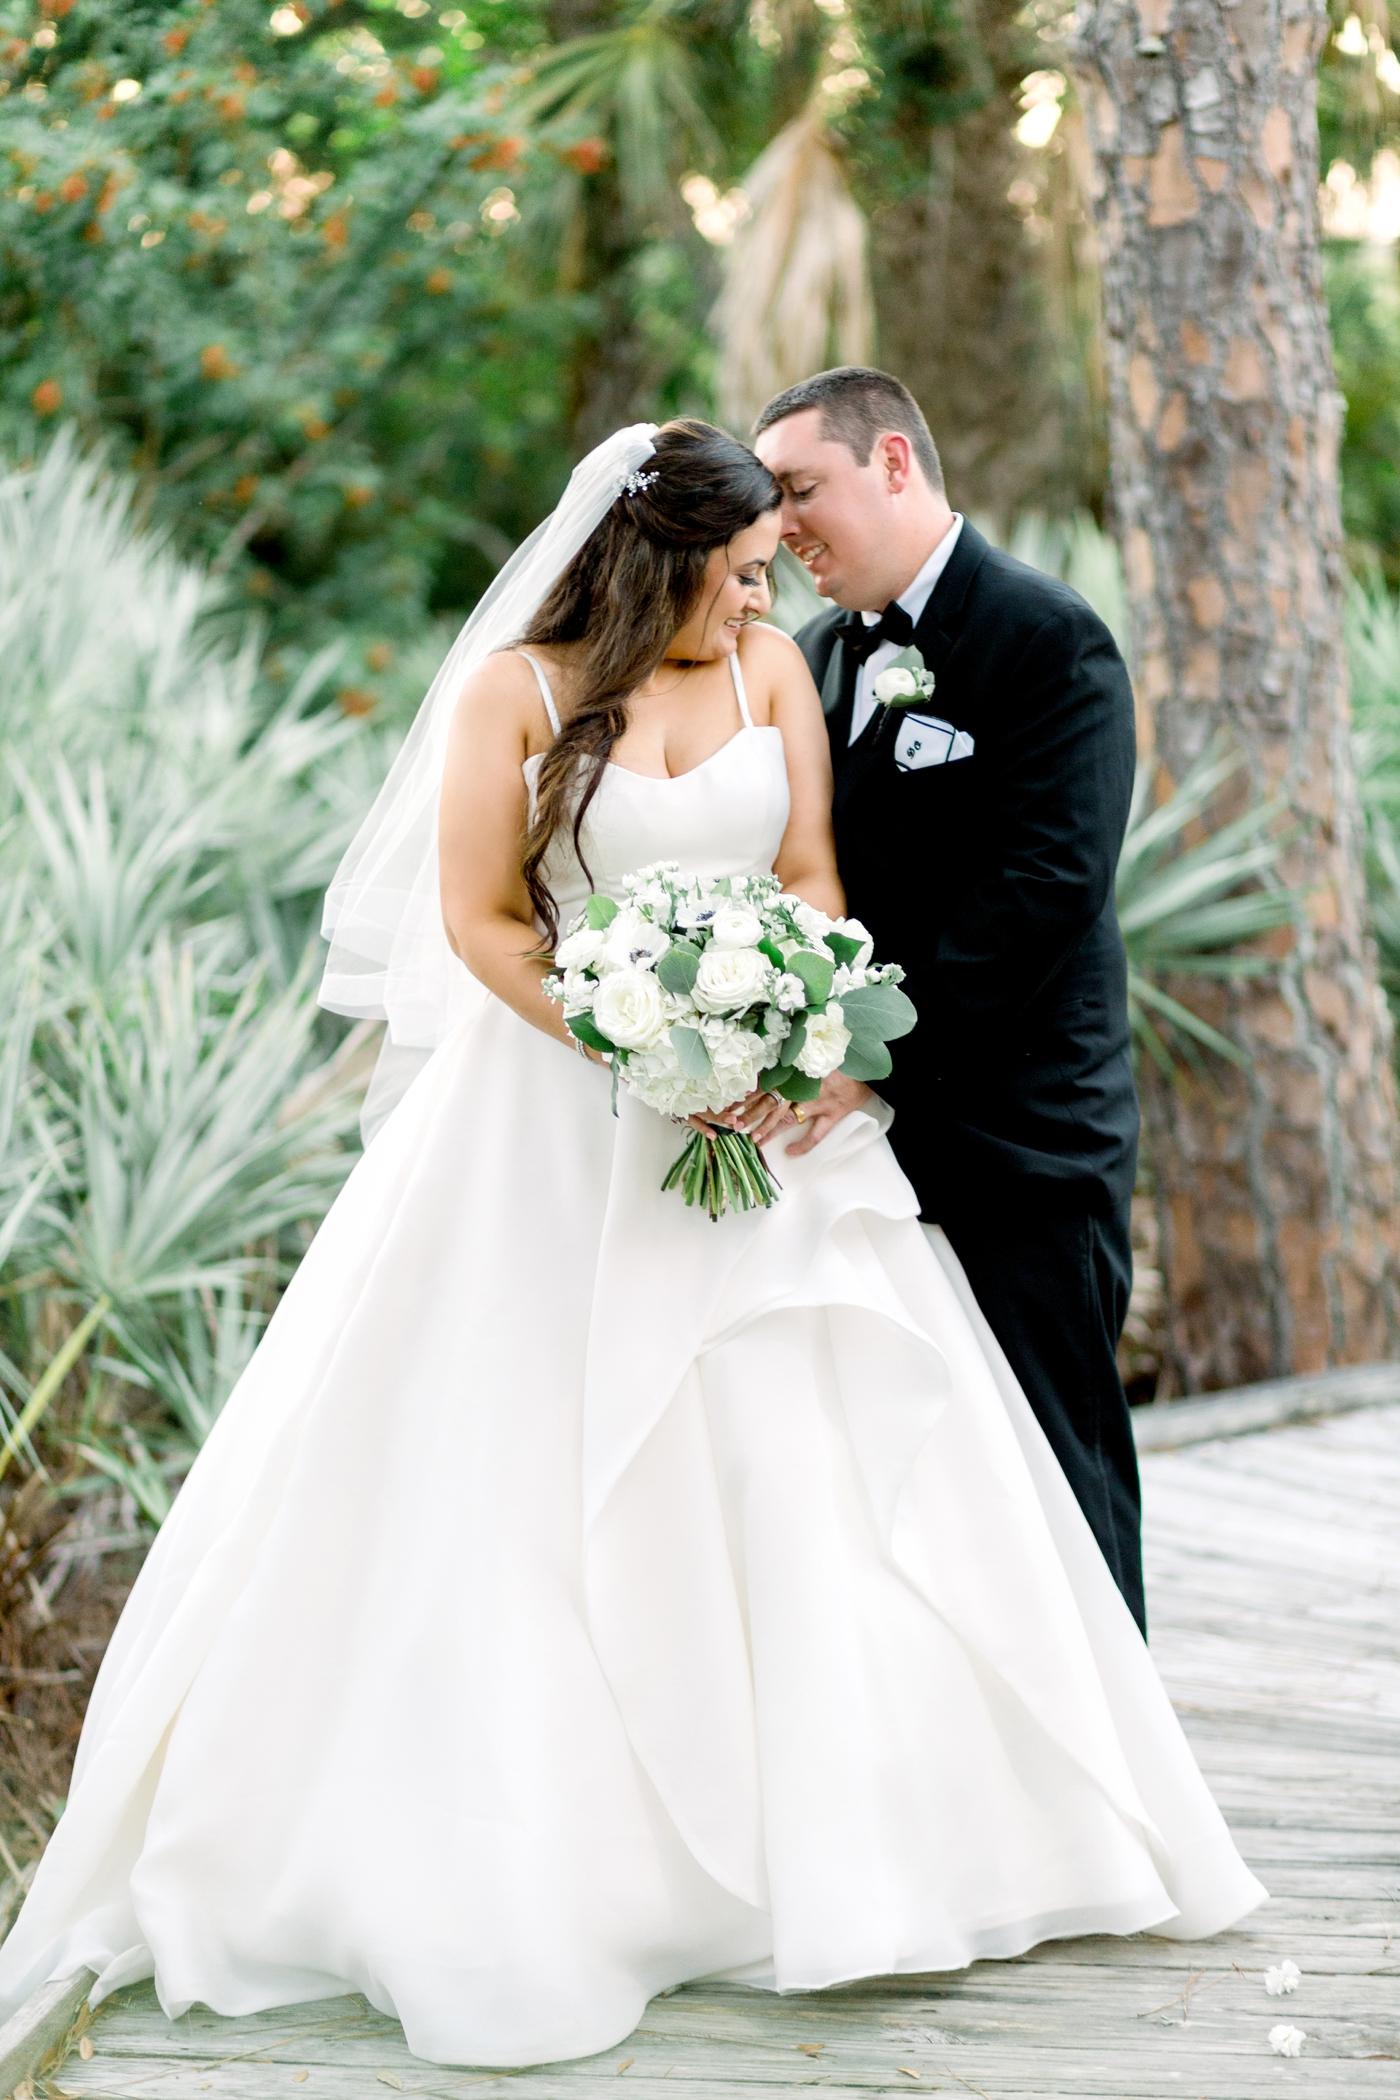 wedding portrait photography orlando